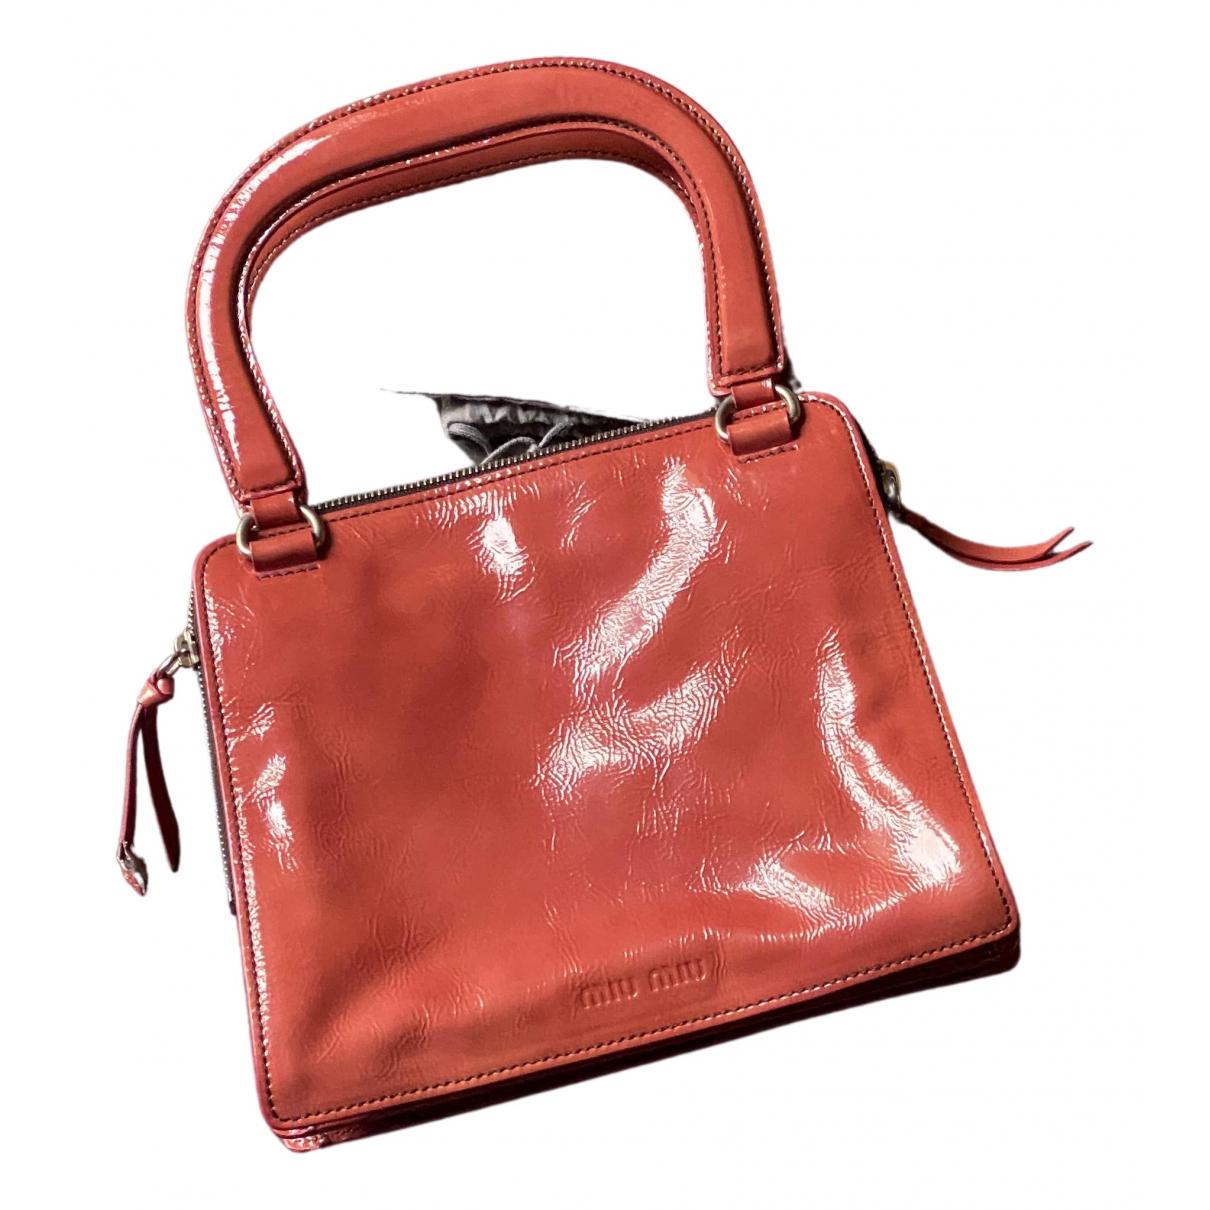 Miu Miu - Sac a main   pour femme en cuir - rouge